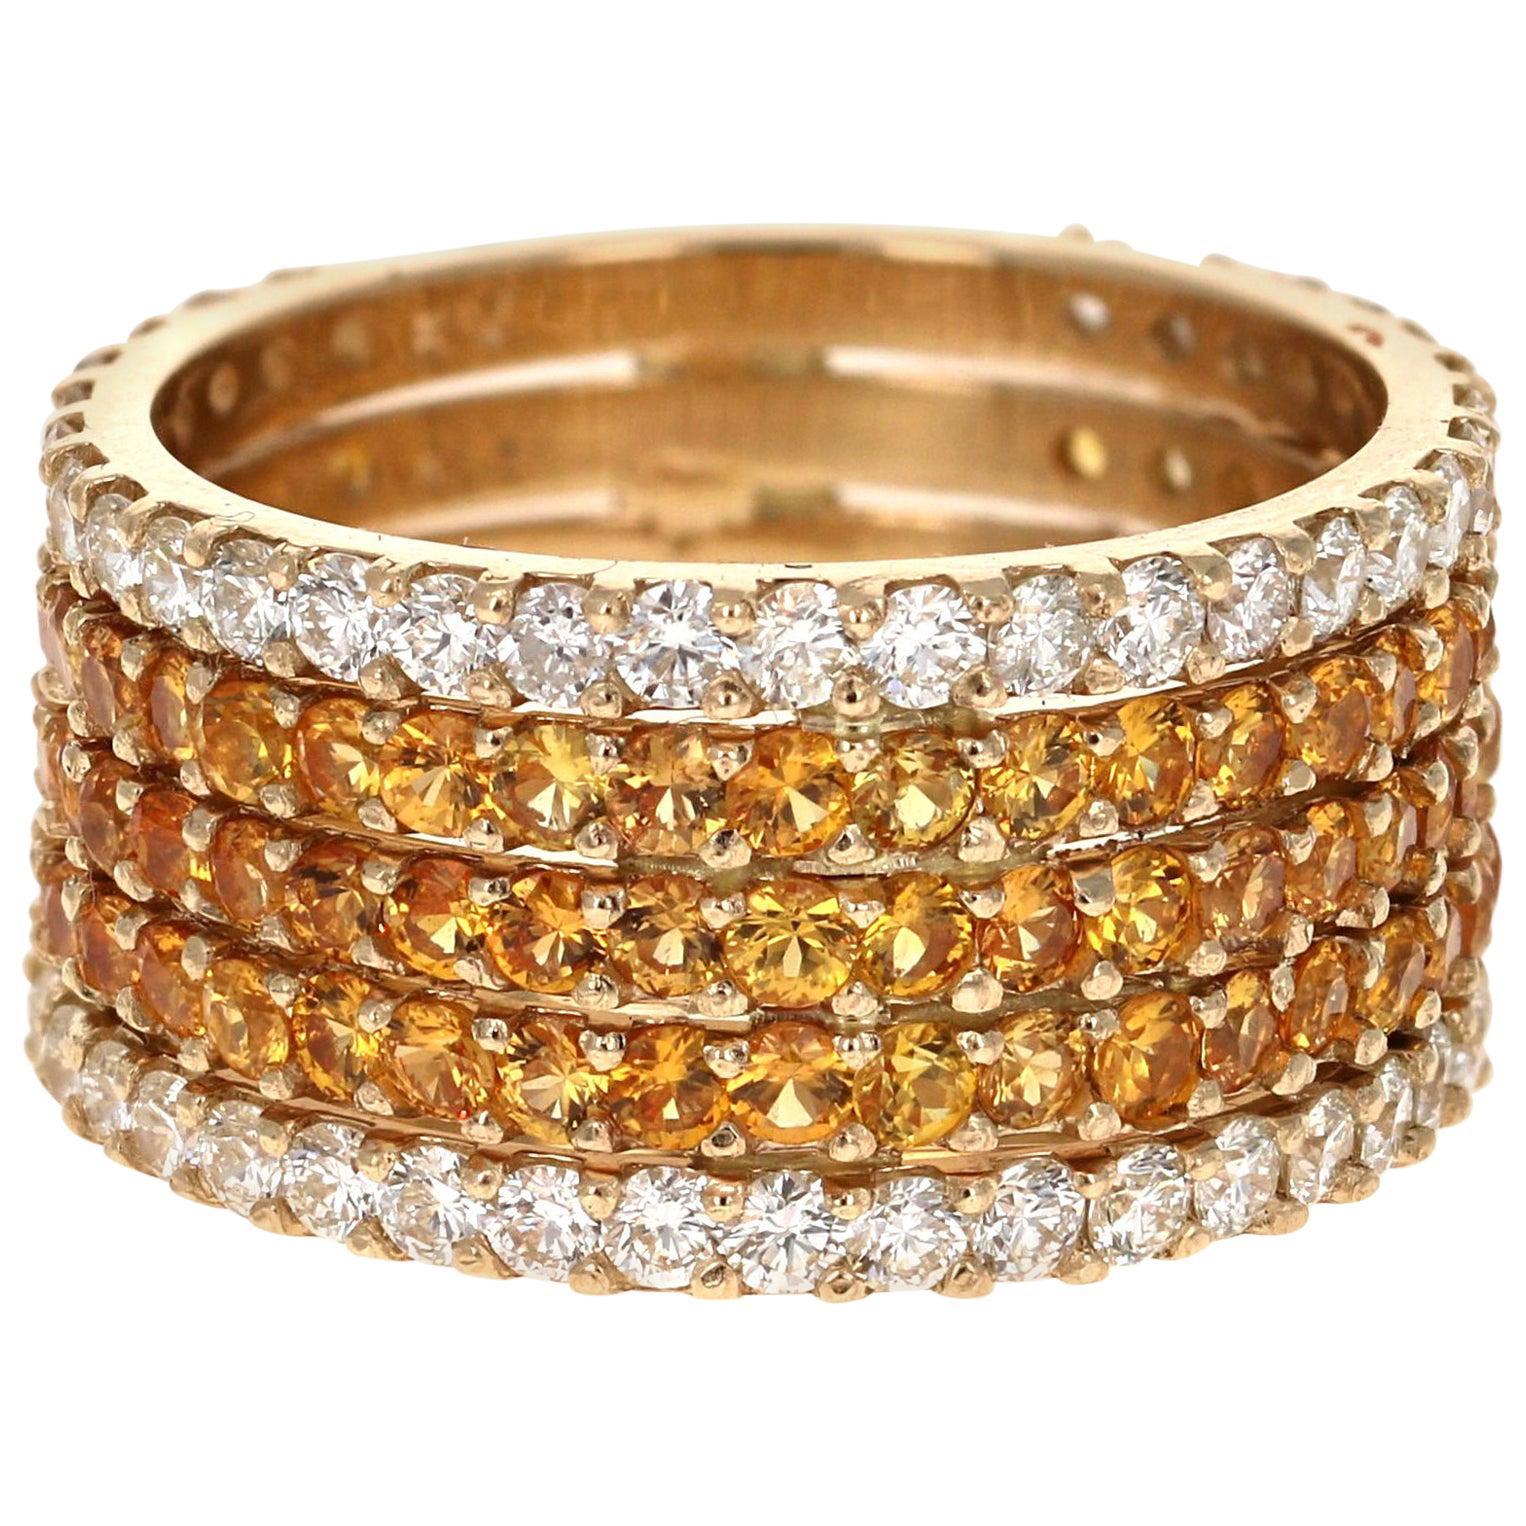 4.23 Carat Yellow Sapphire and White Diamond 14 Karat Yellow Gold Band